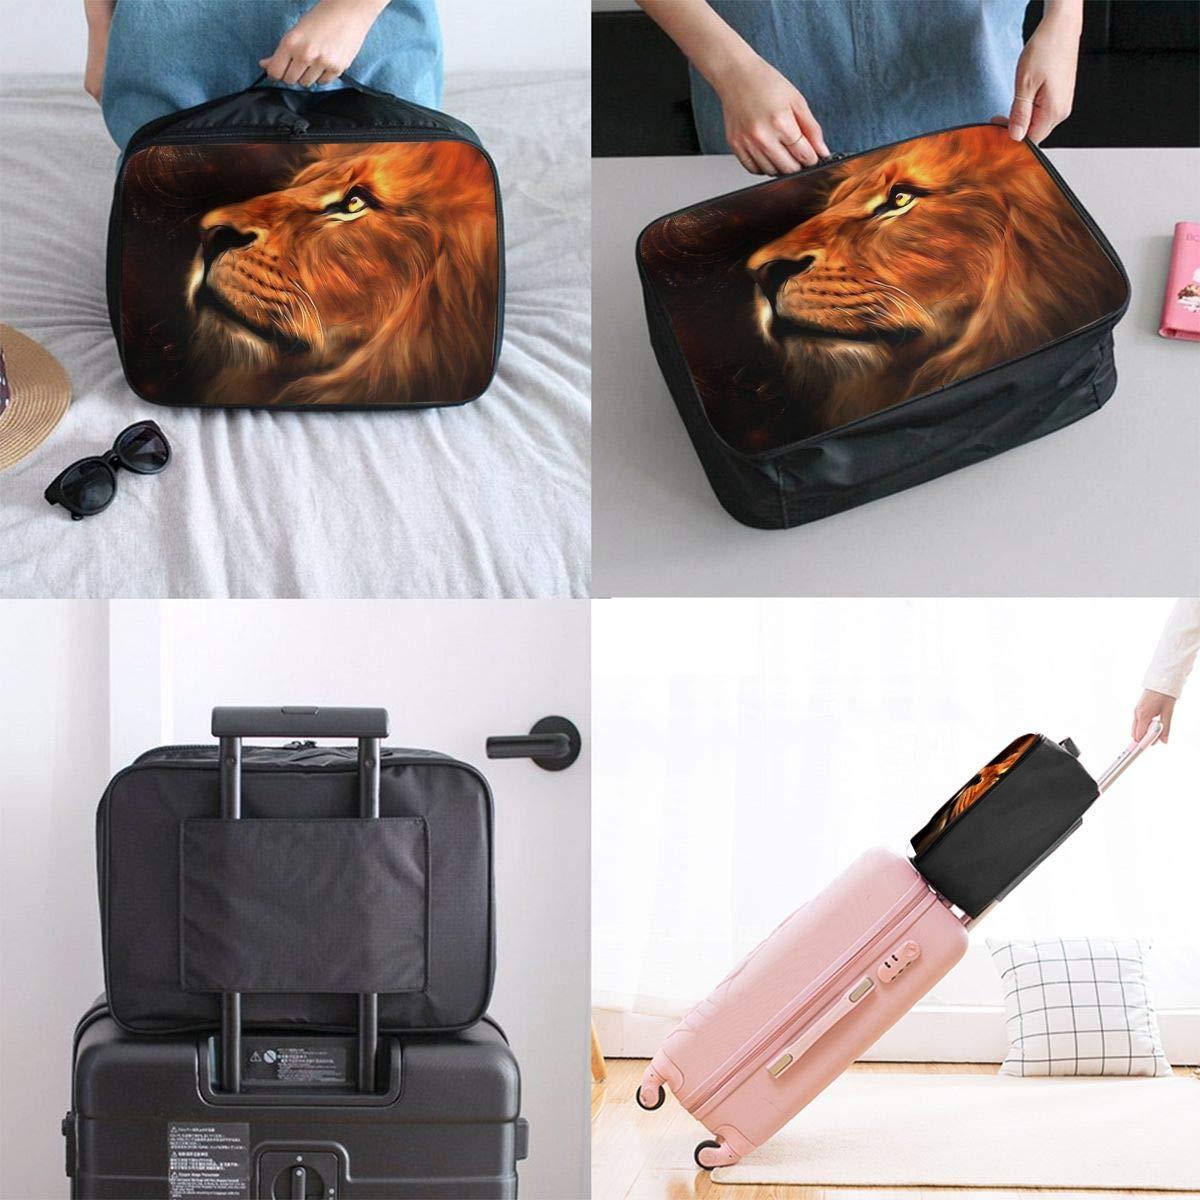 Travel Luggage Duffle Bag Lightweight Portable Handbag Fire Lion Print Large Capacity Waterproof Foldable Storage Tote